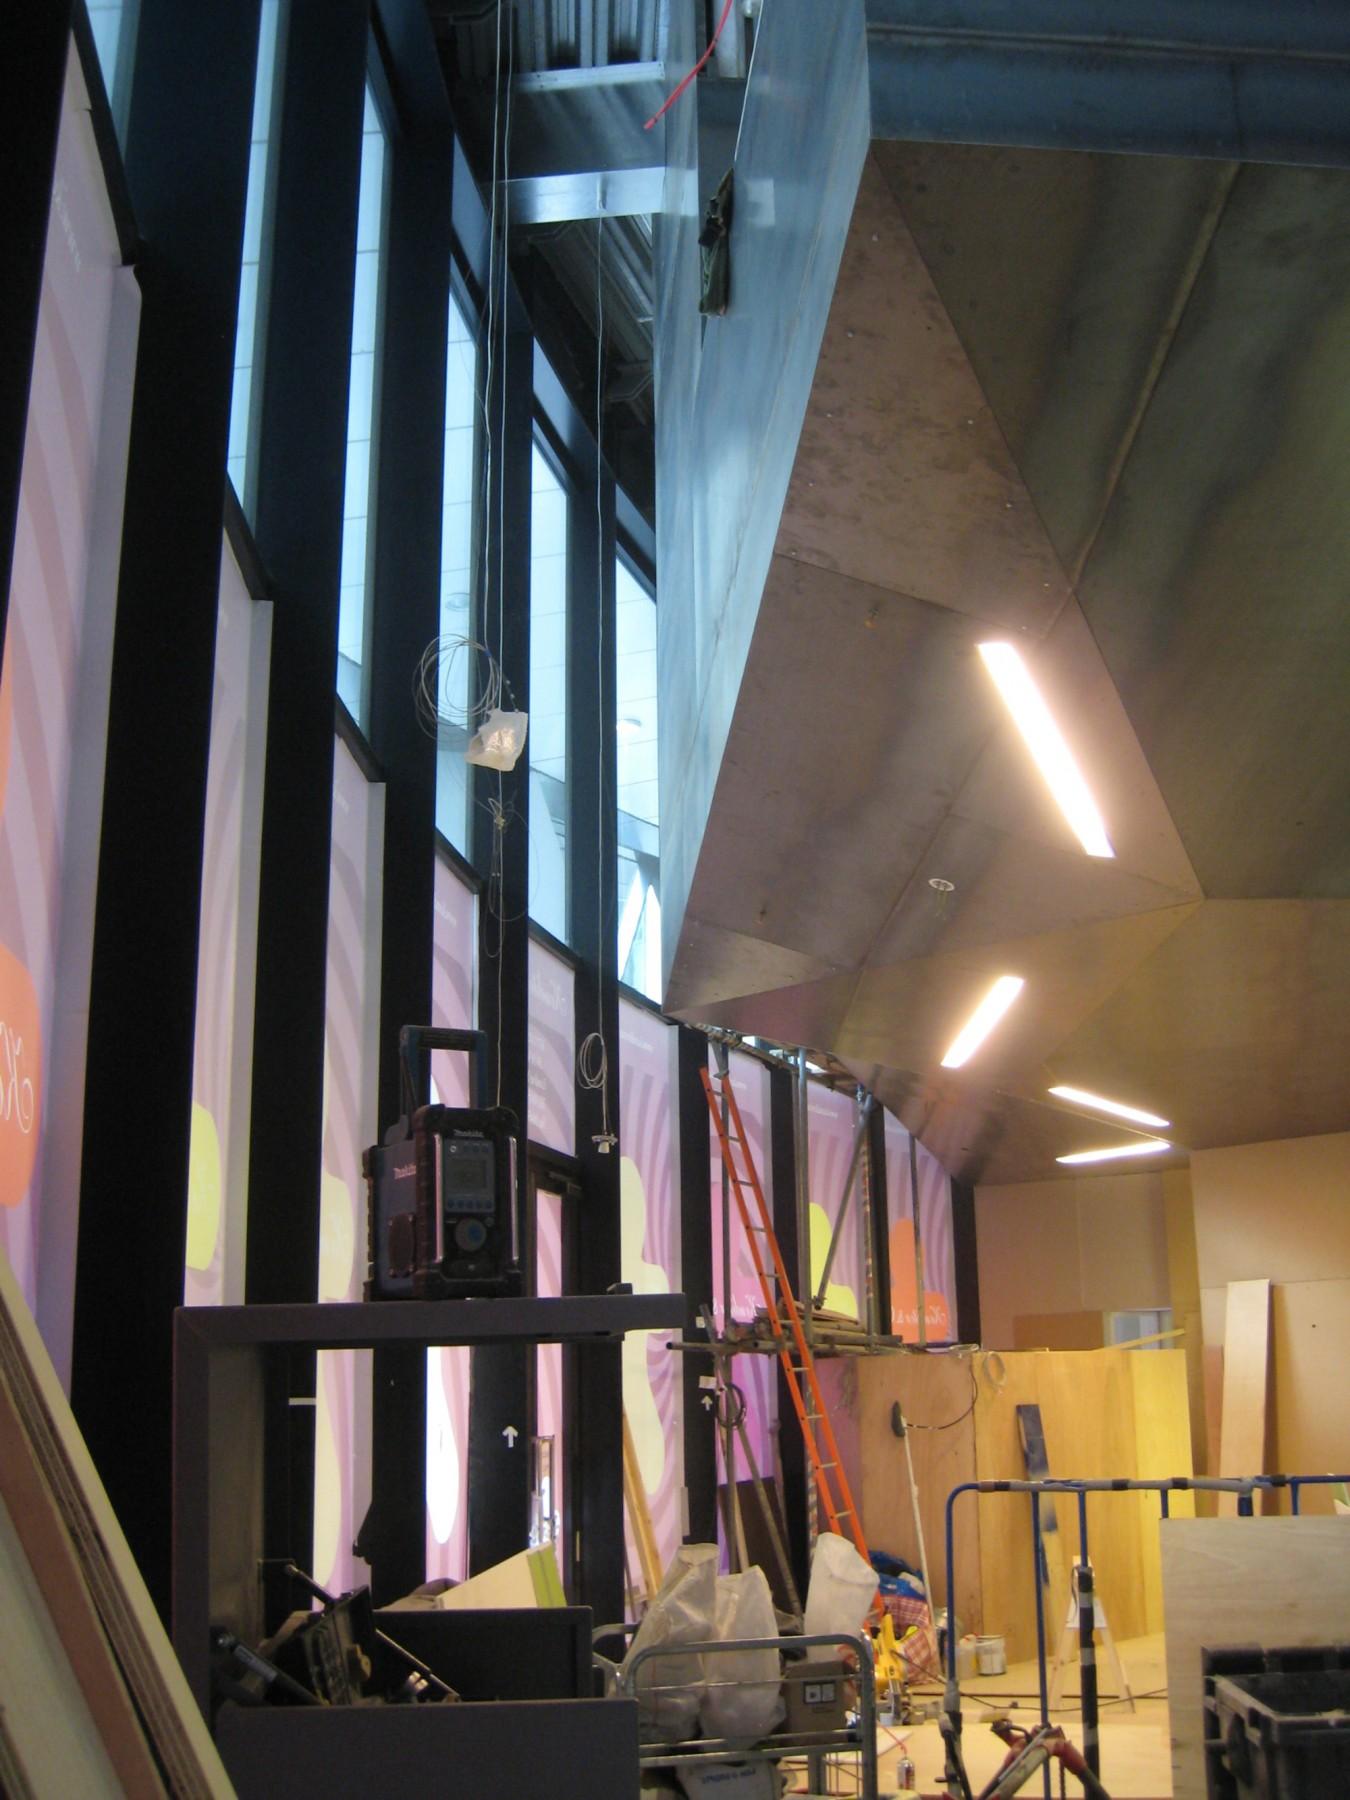 Konditor-&-Cook-cake-shop-cafe-retail-London-Jamie-Fobert-Architects-steel-30-St-Mary-Axe-gherkin-development-2